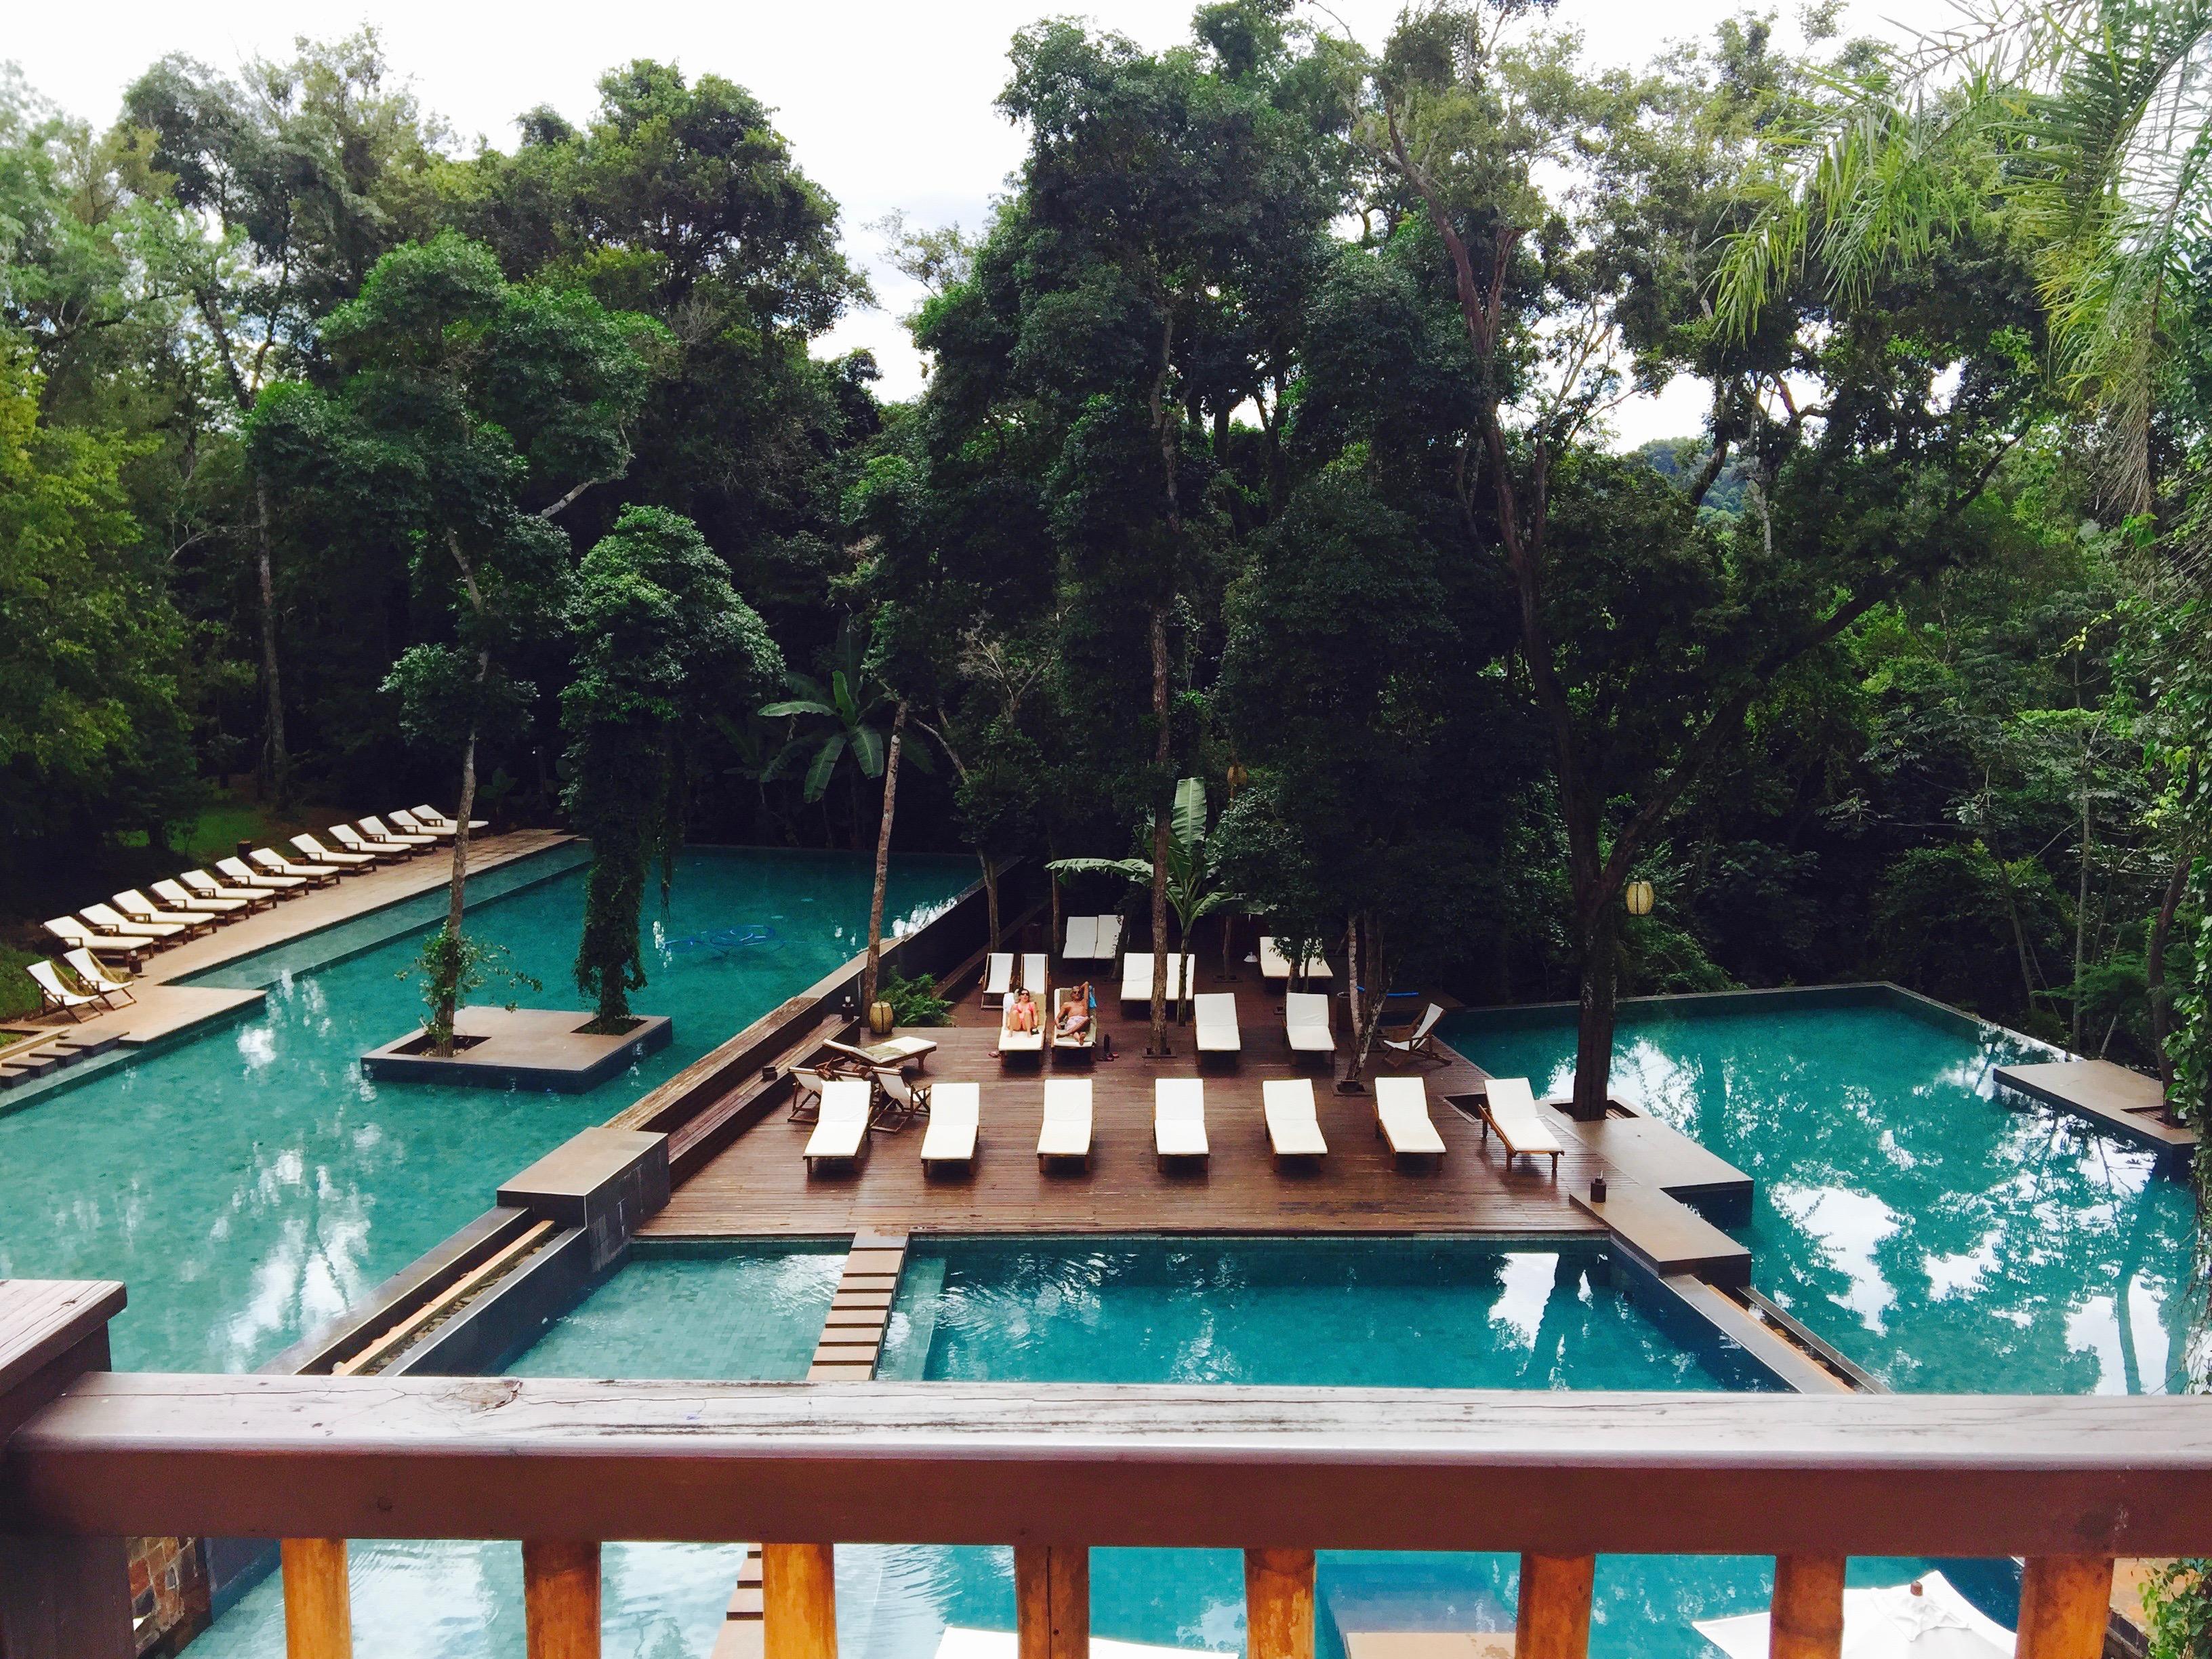 Loí Suites Iguazu Hotel argentina